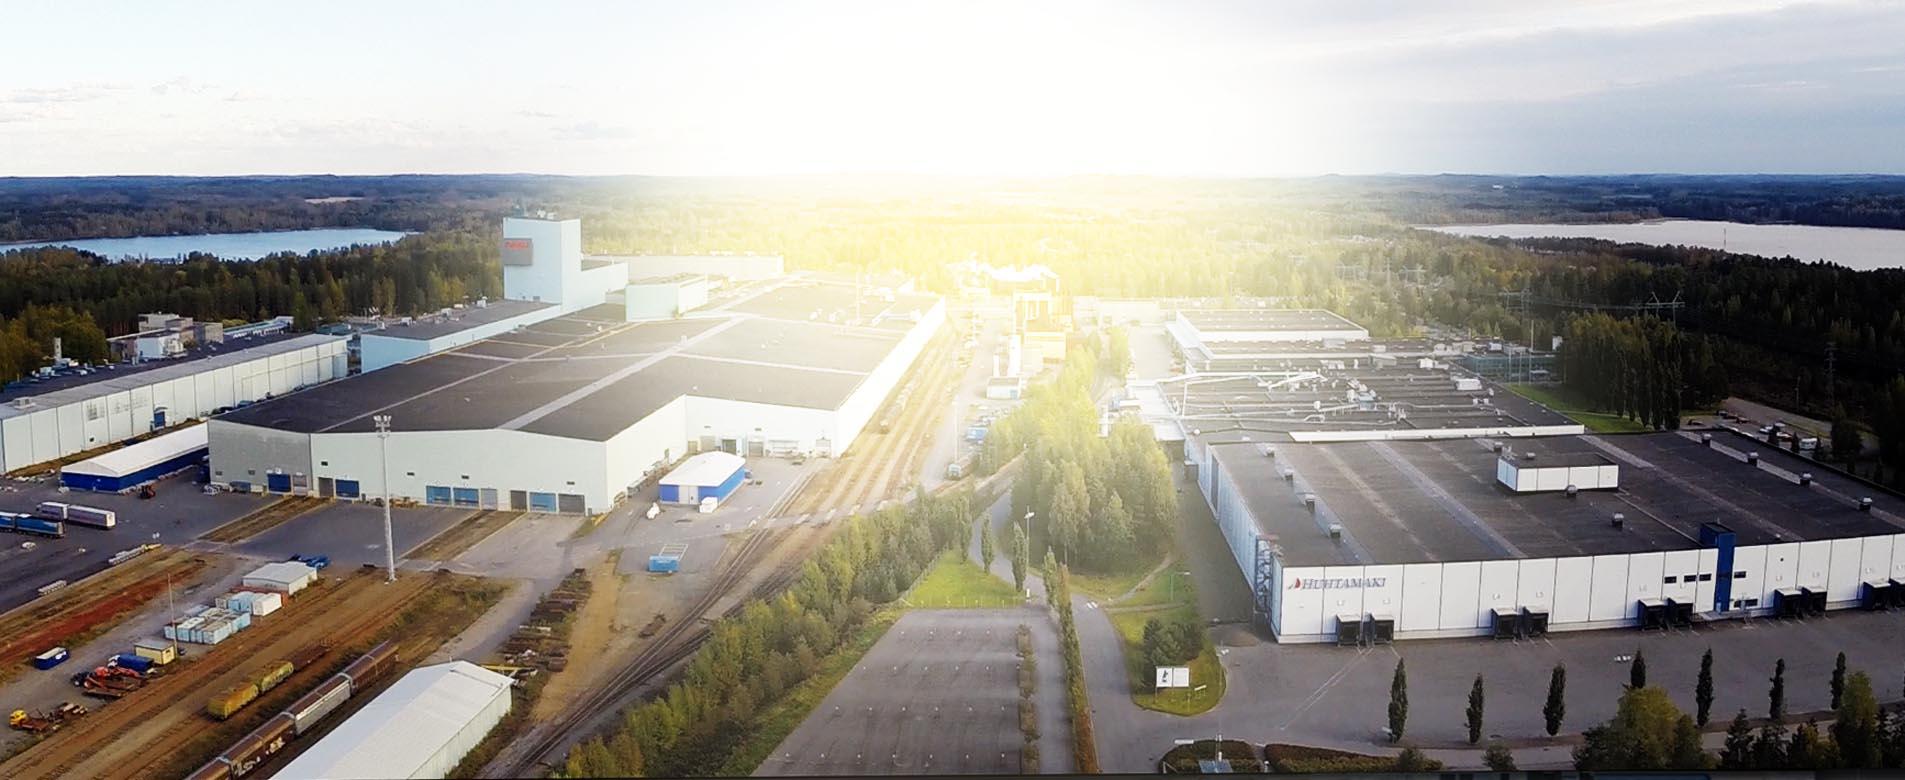 www.visiotili.teollisuus3